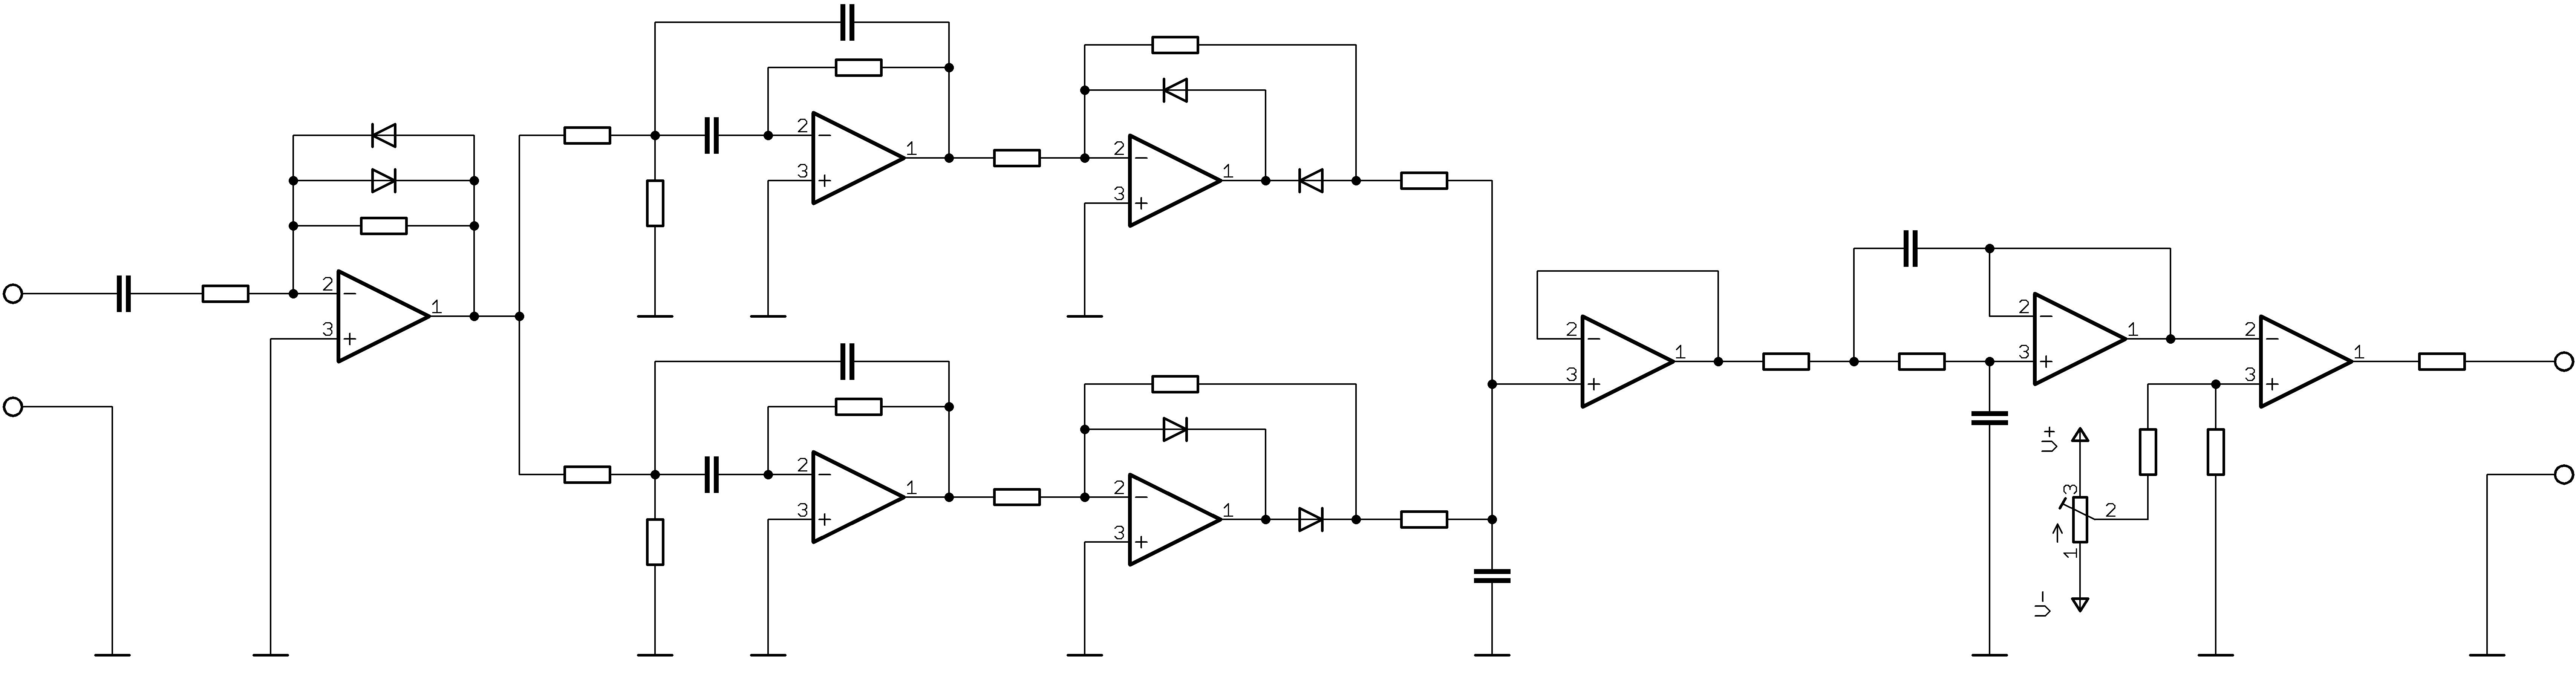 FSK demodulation - Mikrocontroller net